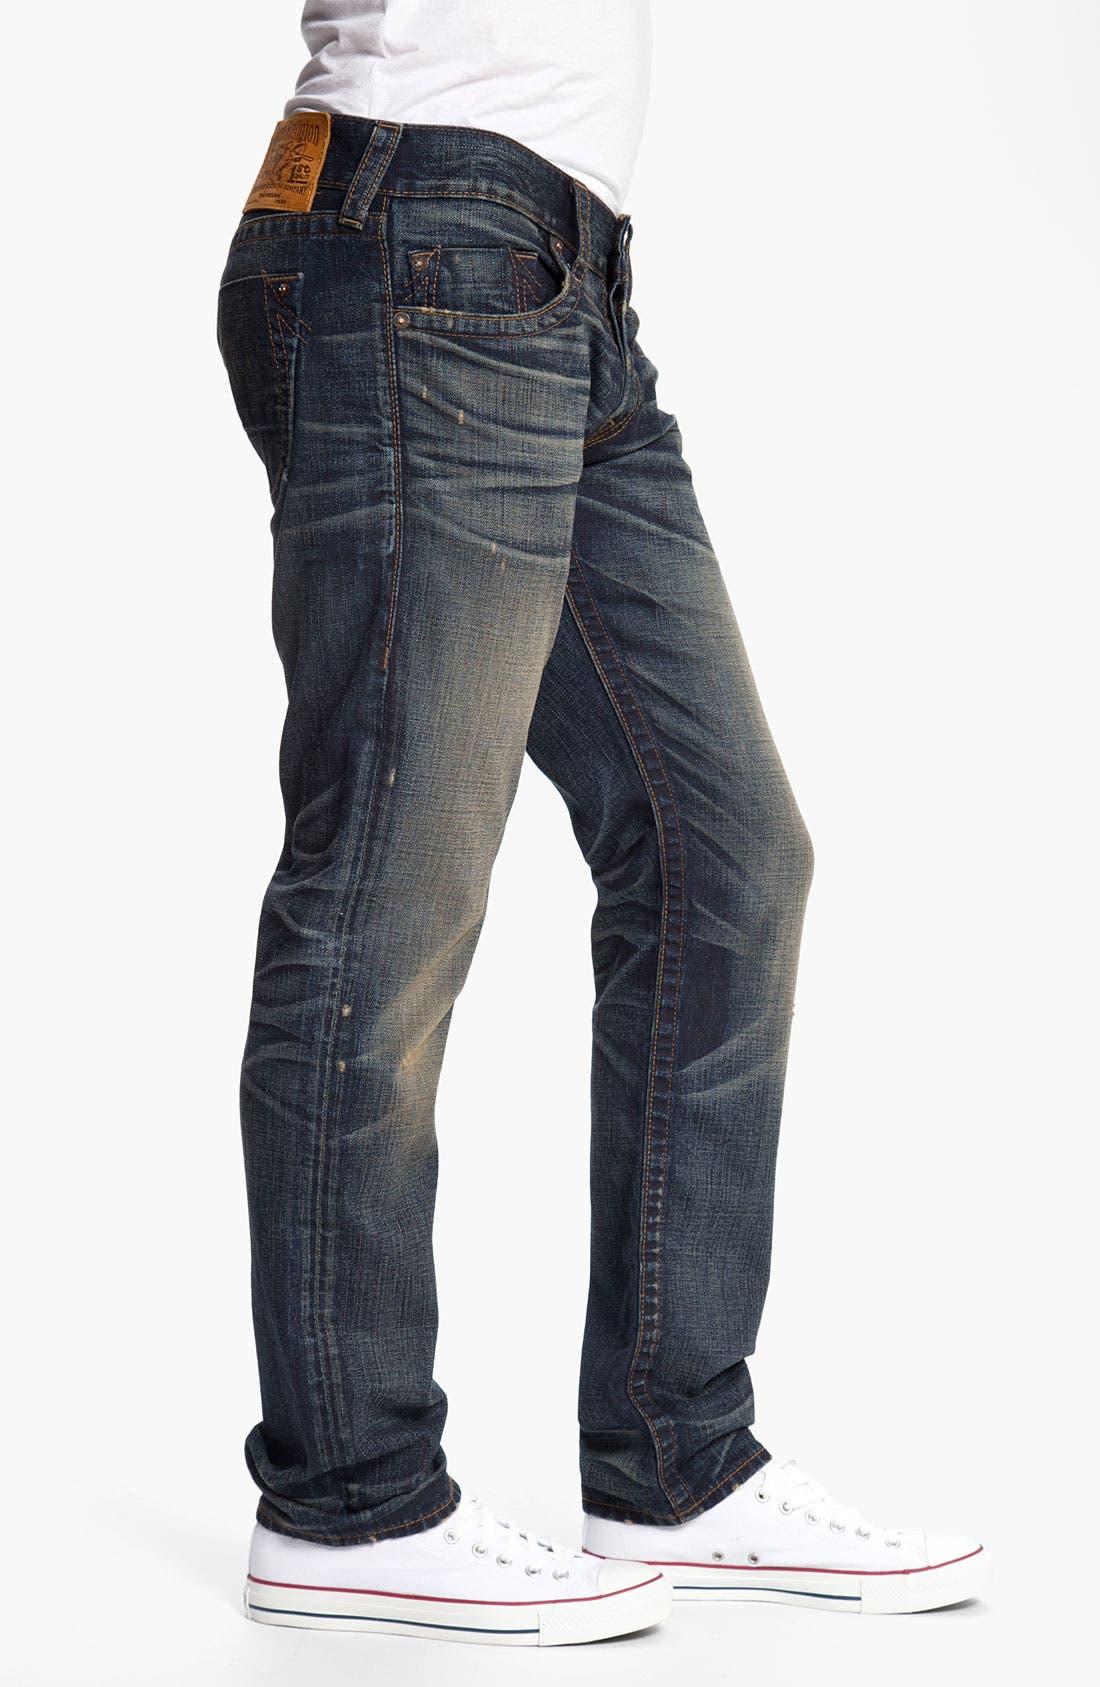 Alternate Image 3  - True Religion Brand Jeans 'Geno' Slim Straight Leg Jeans (Snyper)